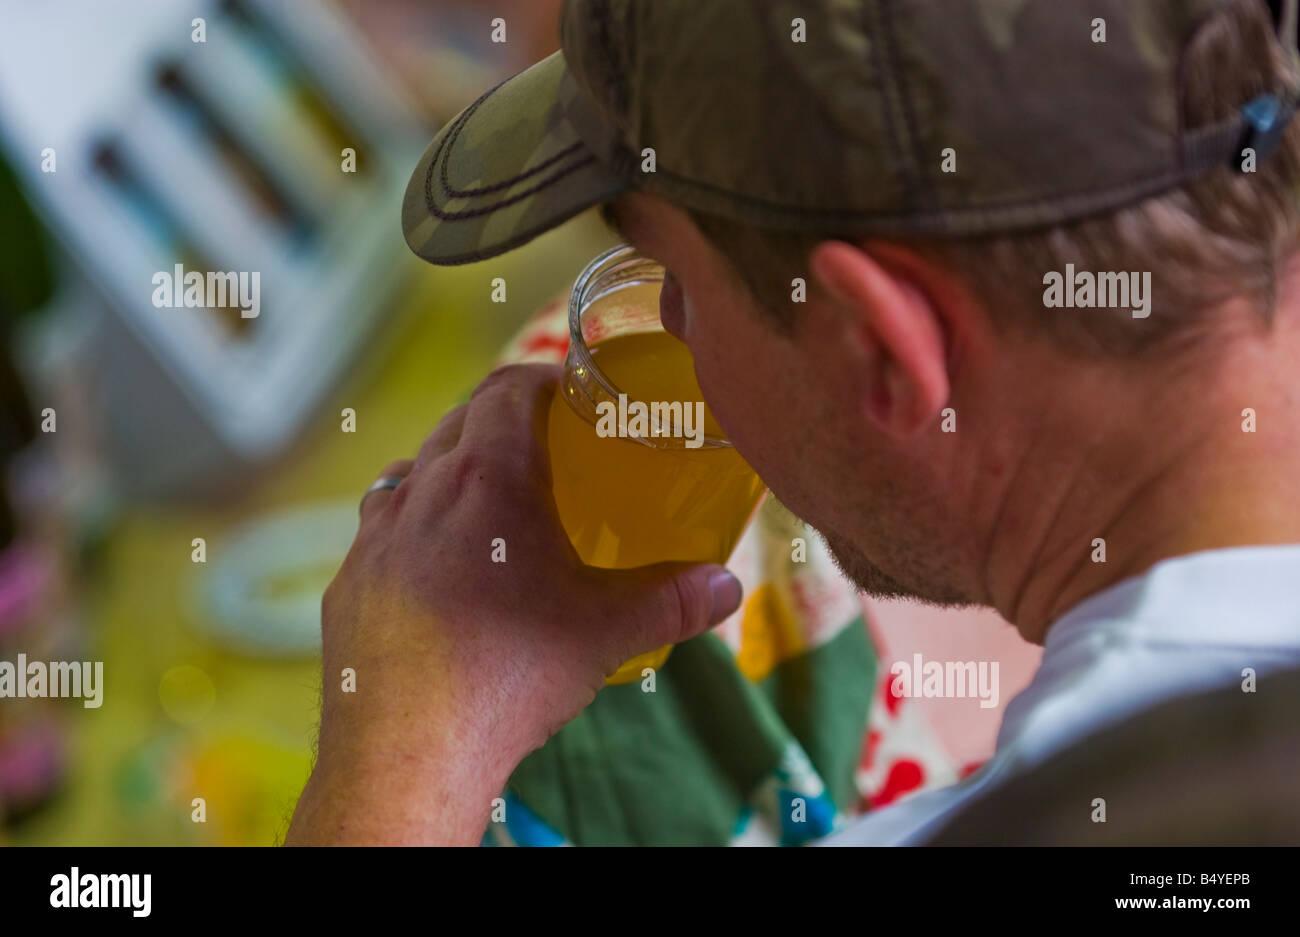 Man drinking pint of scrumpy cider at Abergavenny Food Festival - Stock Image